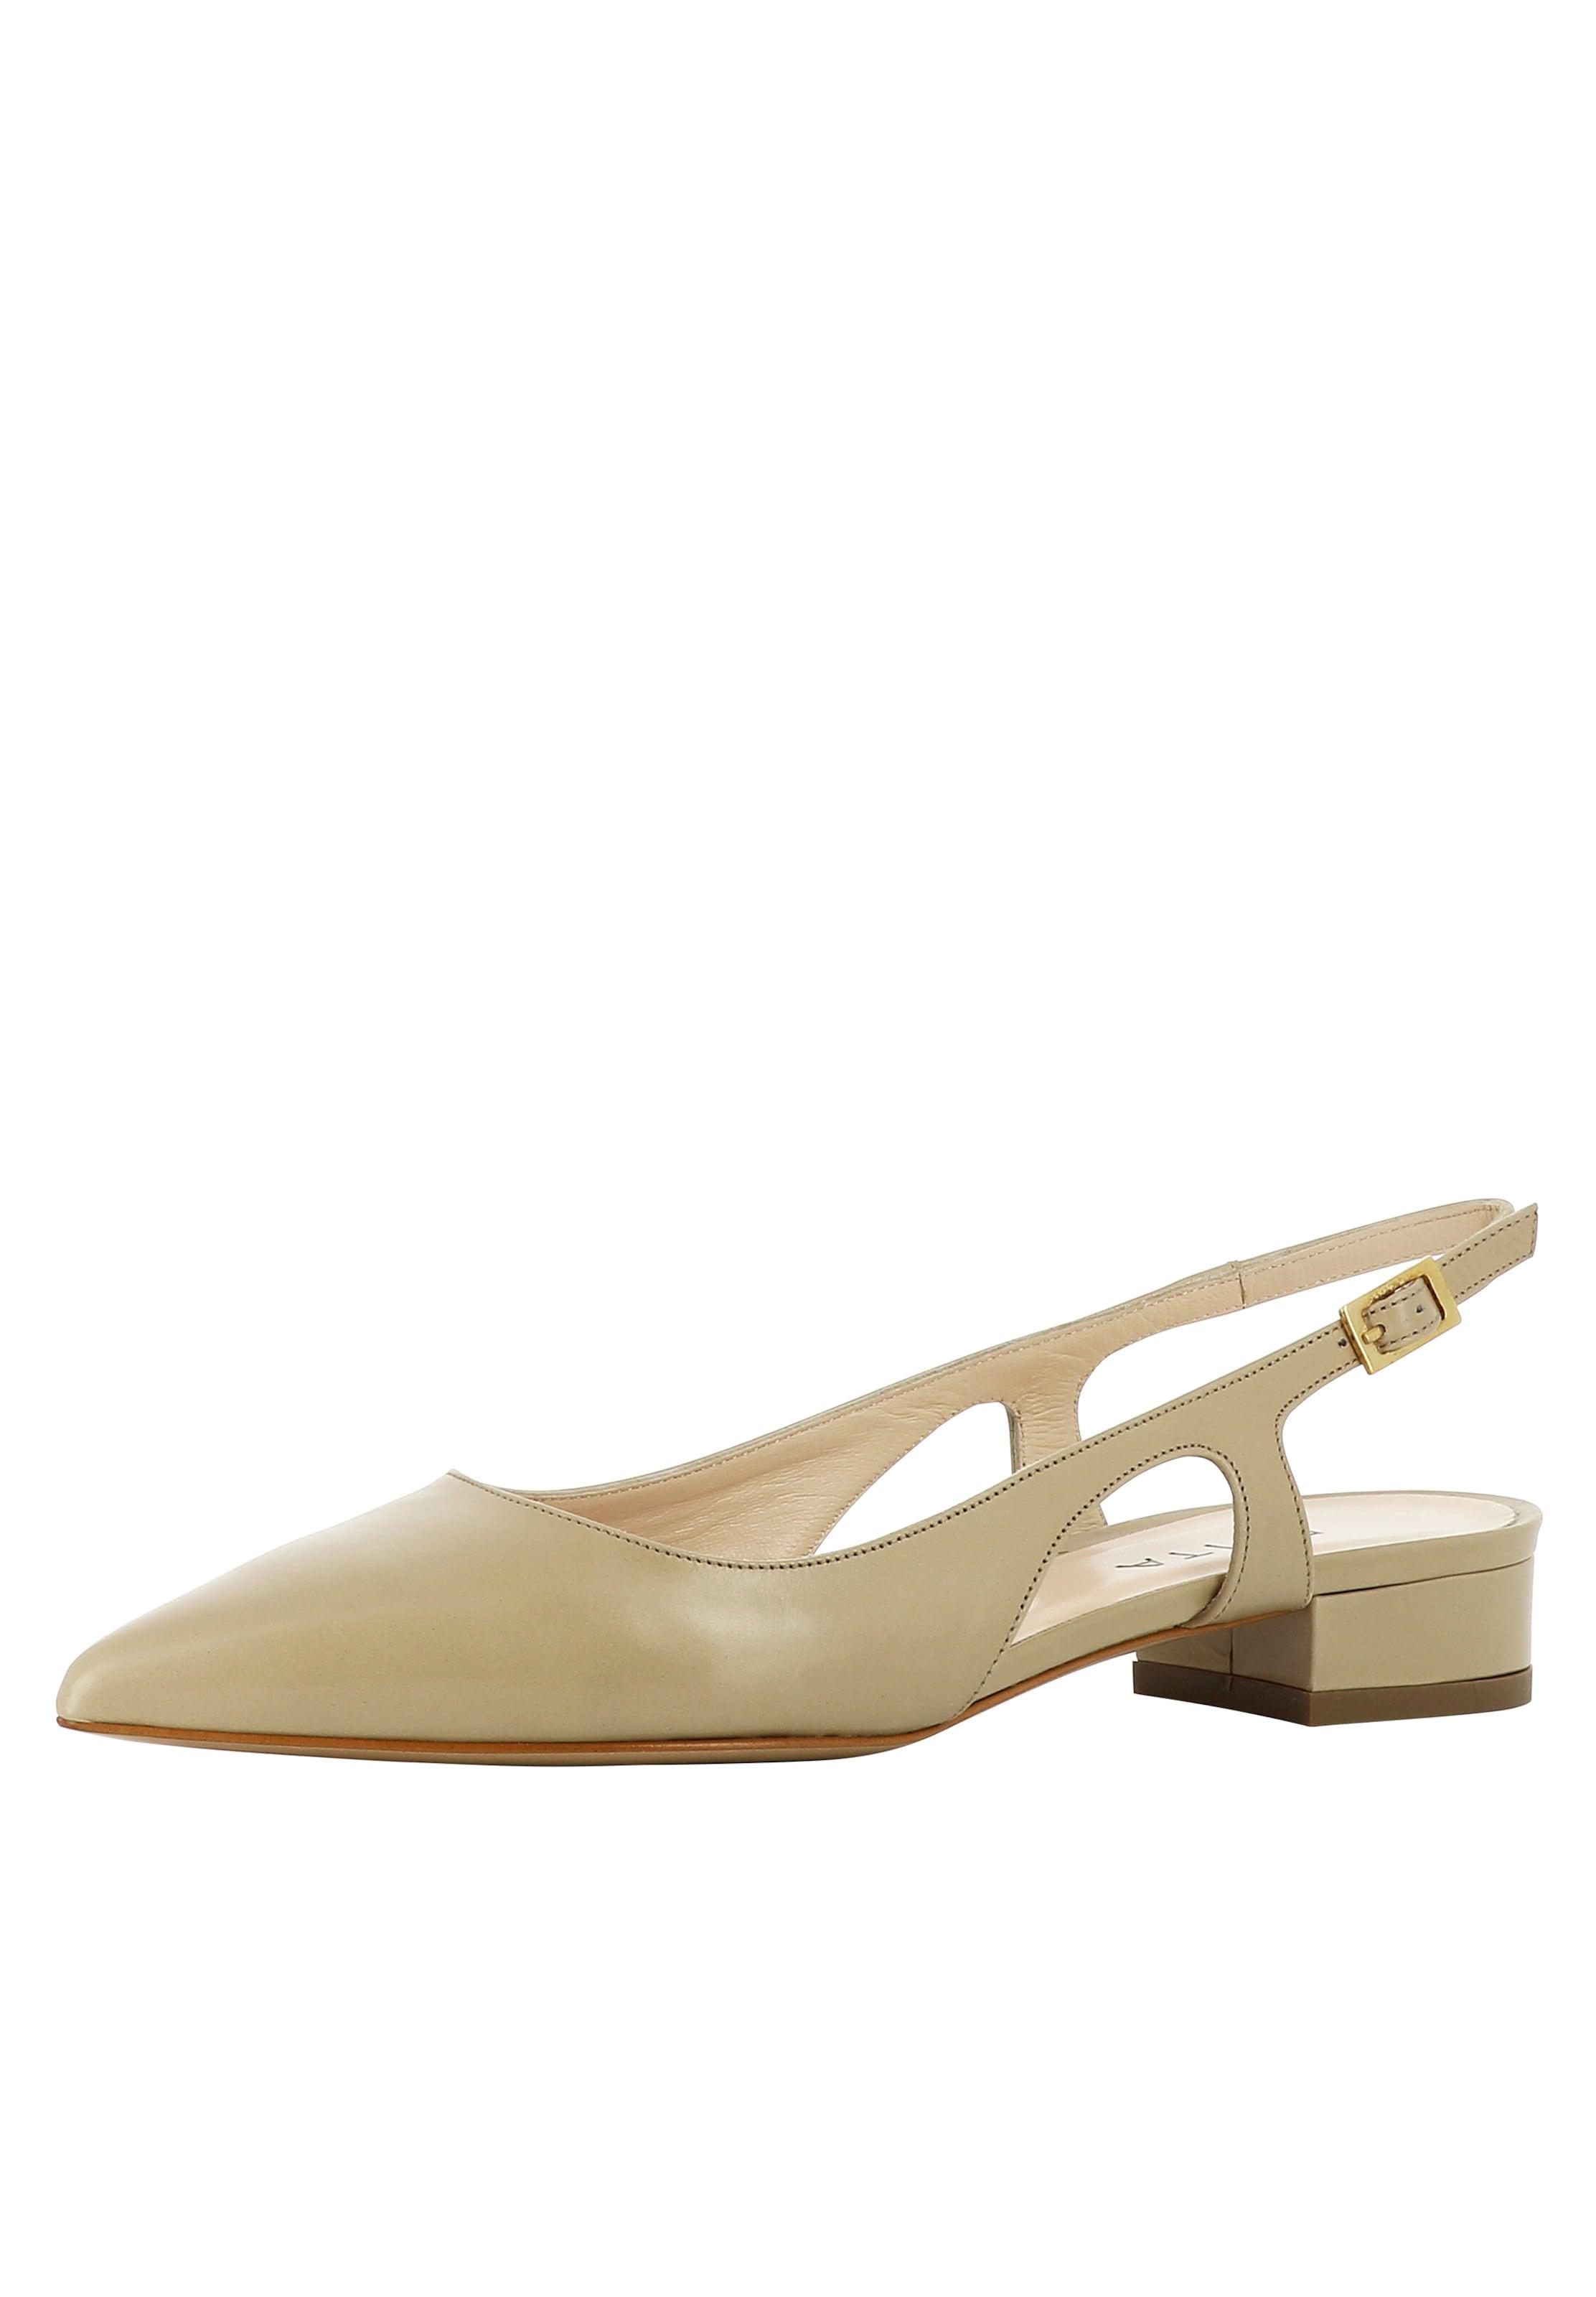 EVITA Damen Schuhe Sling Pumps Verschleißfeste billige Schuhe Damen c403b8